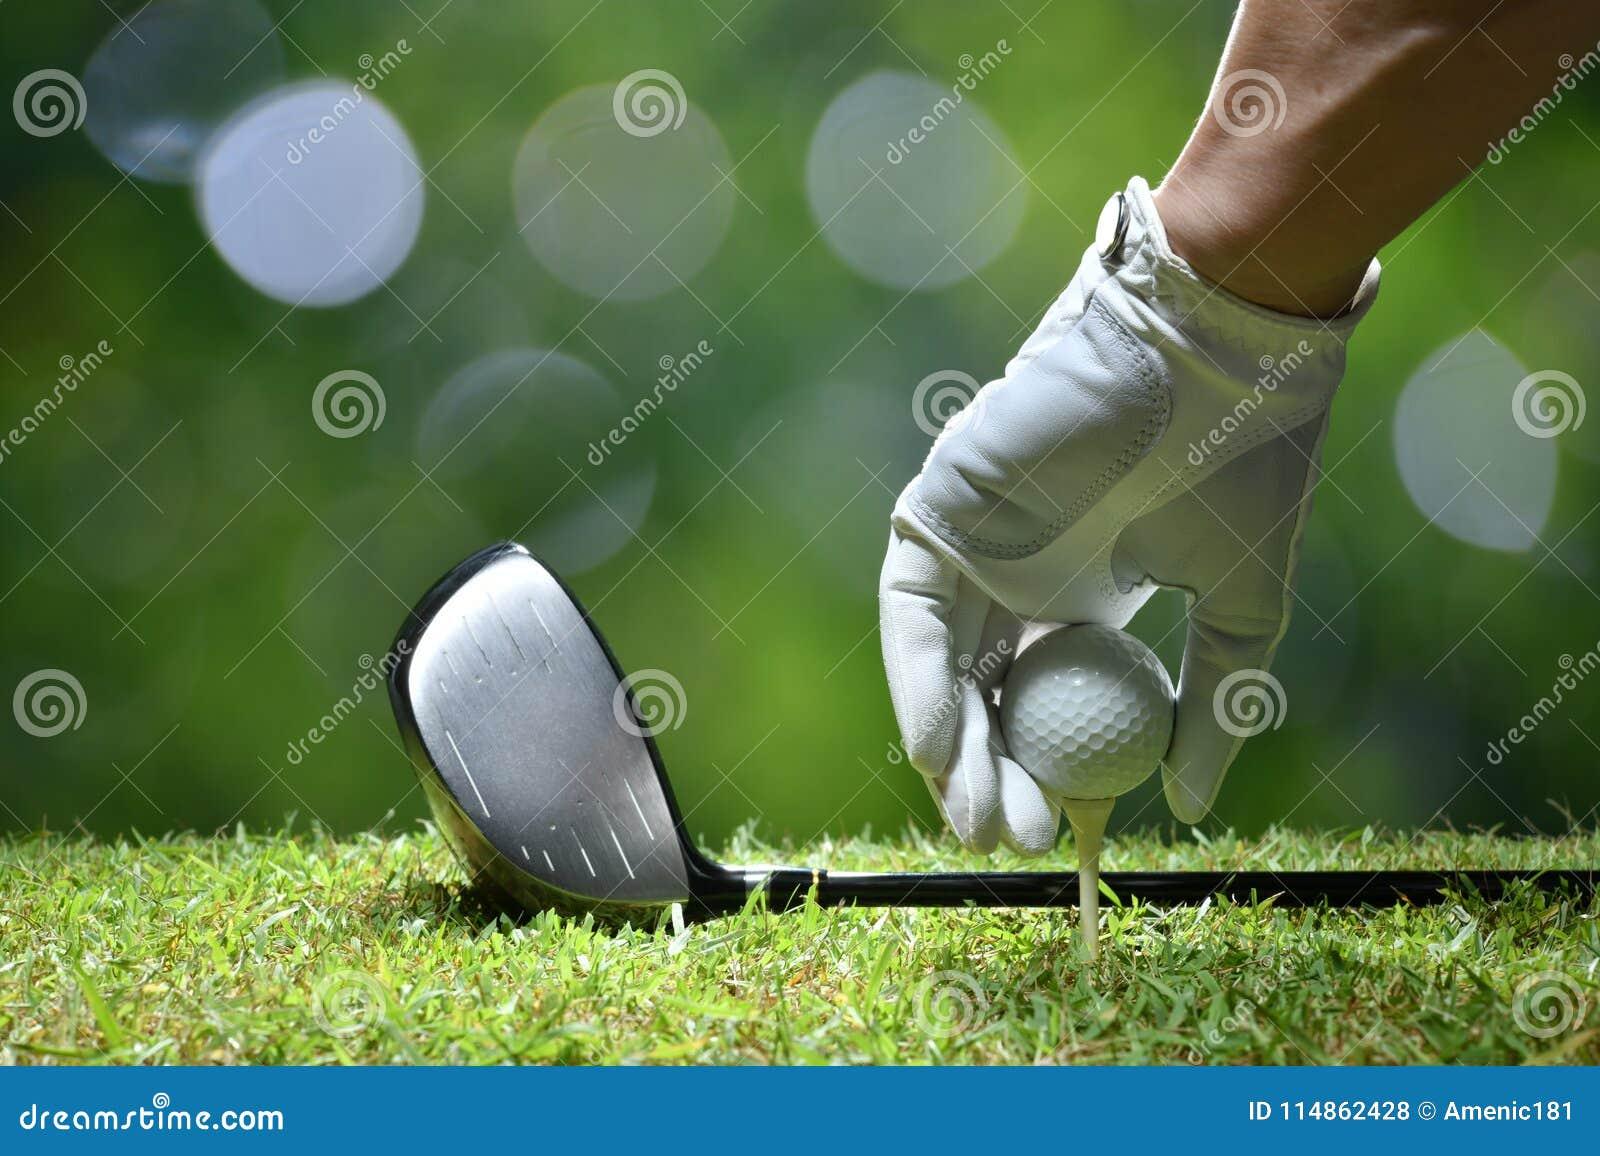 Hand hold golf ball with tee